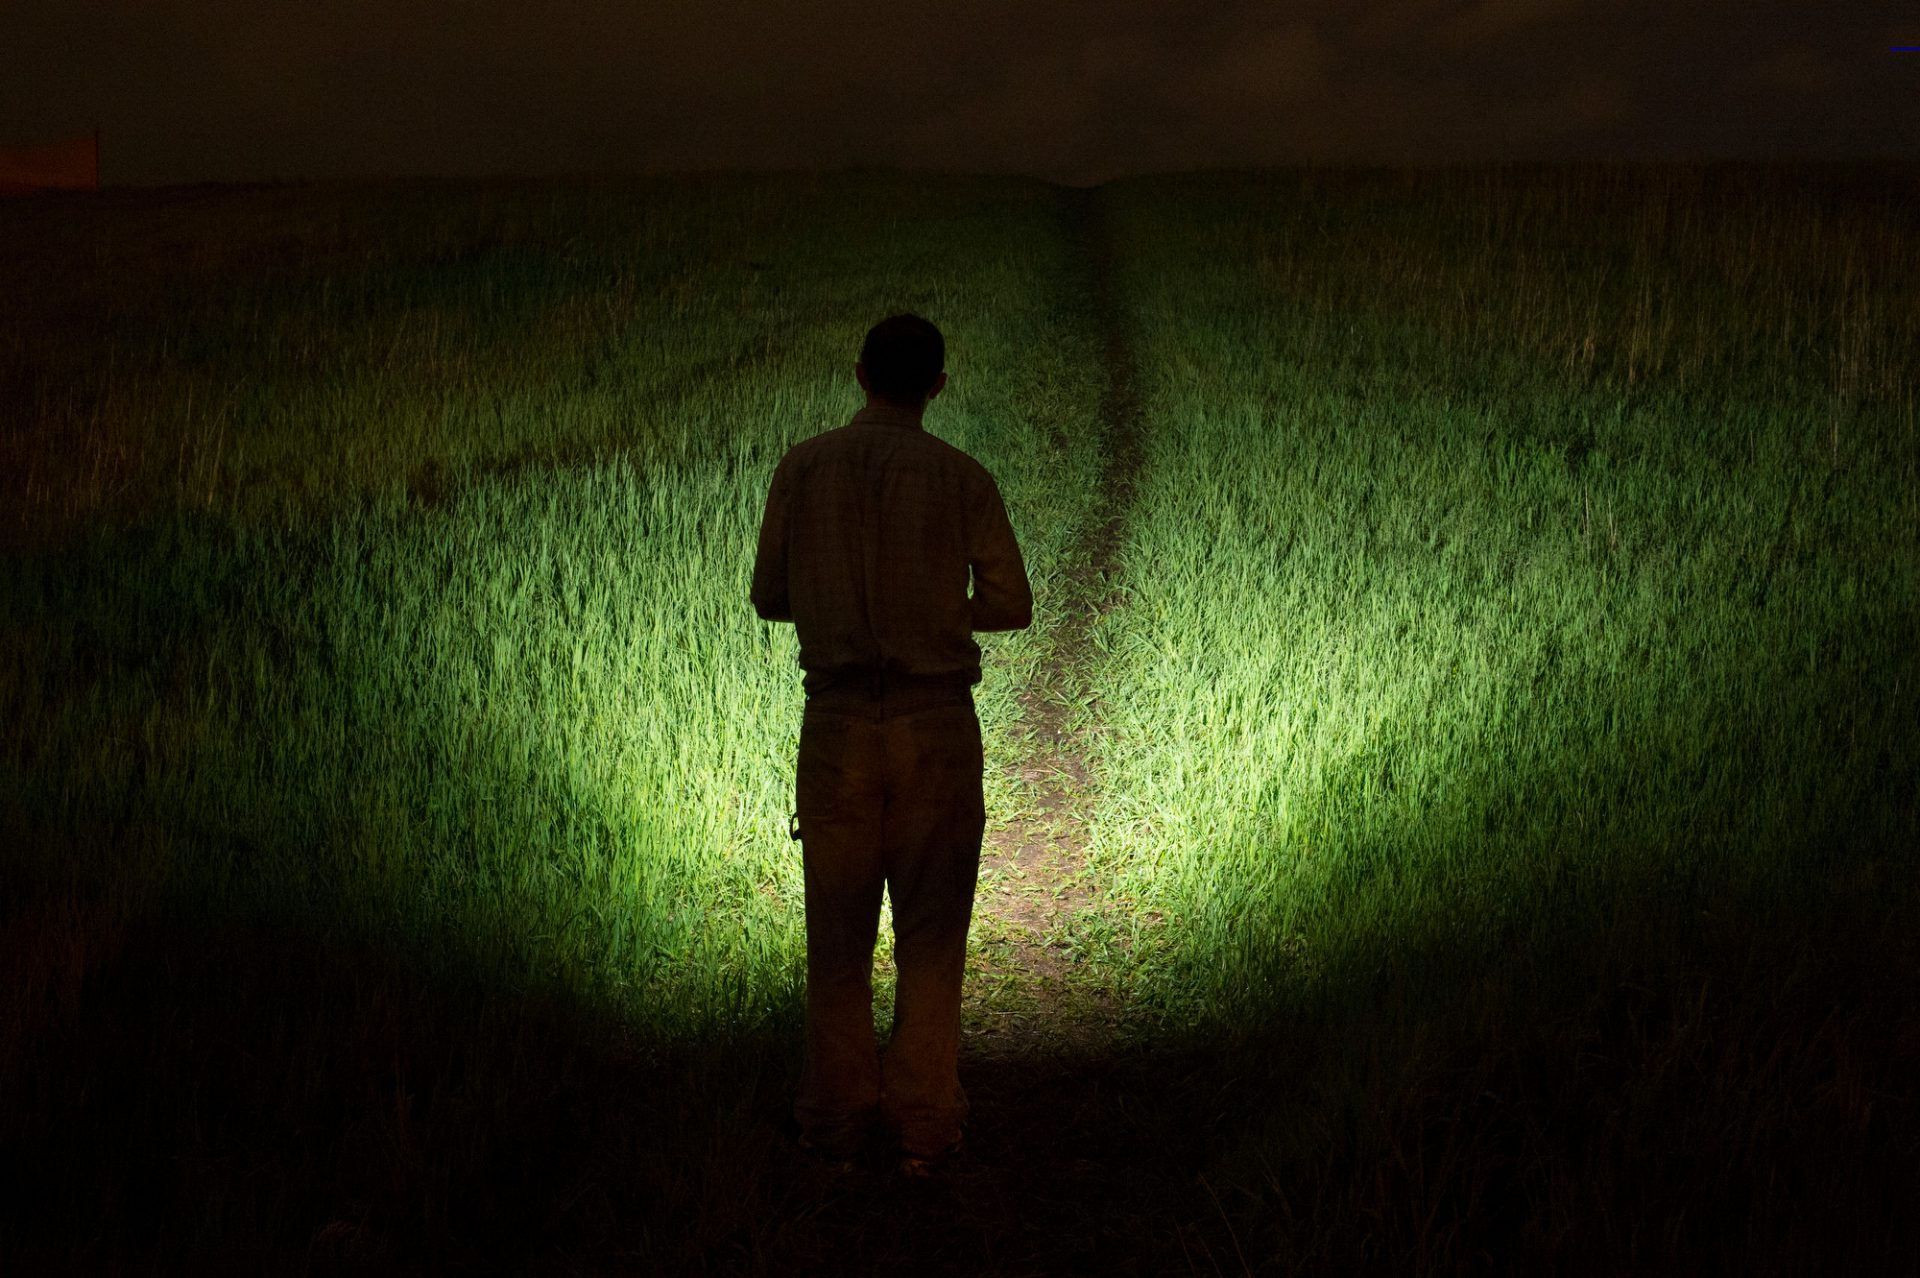 Photo: A man illuminates a field with a flashlight.